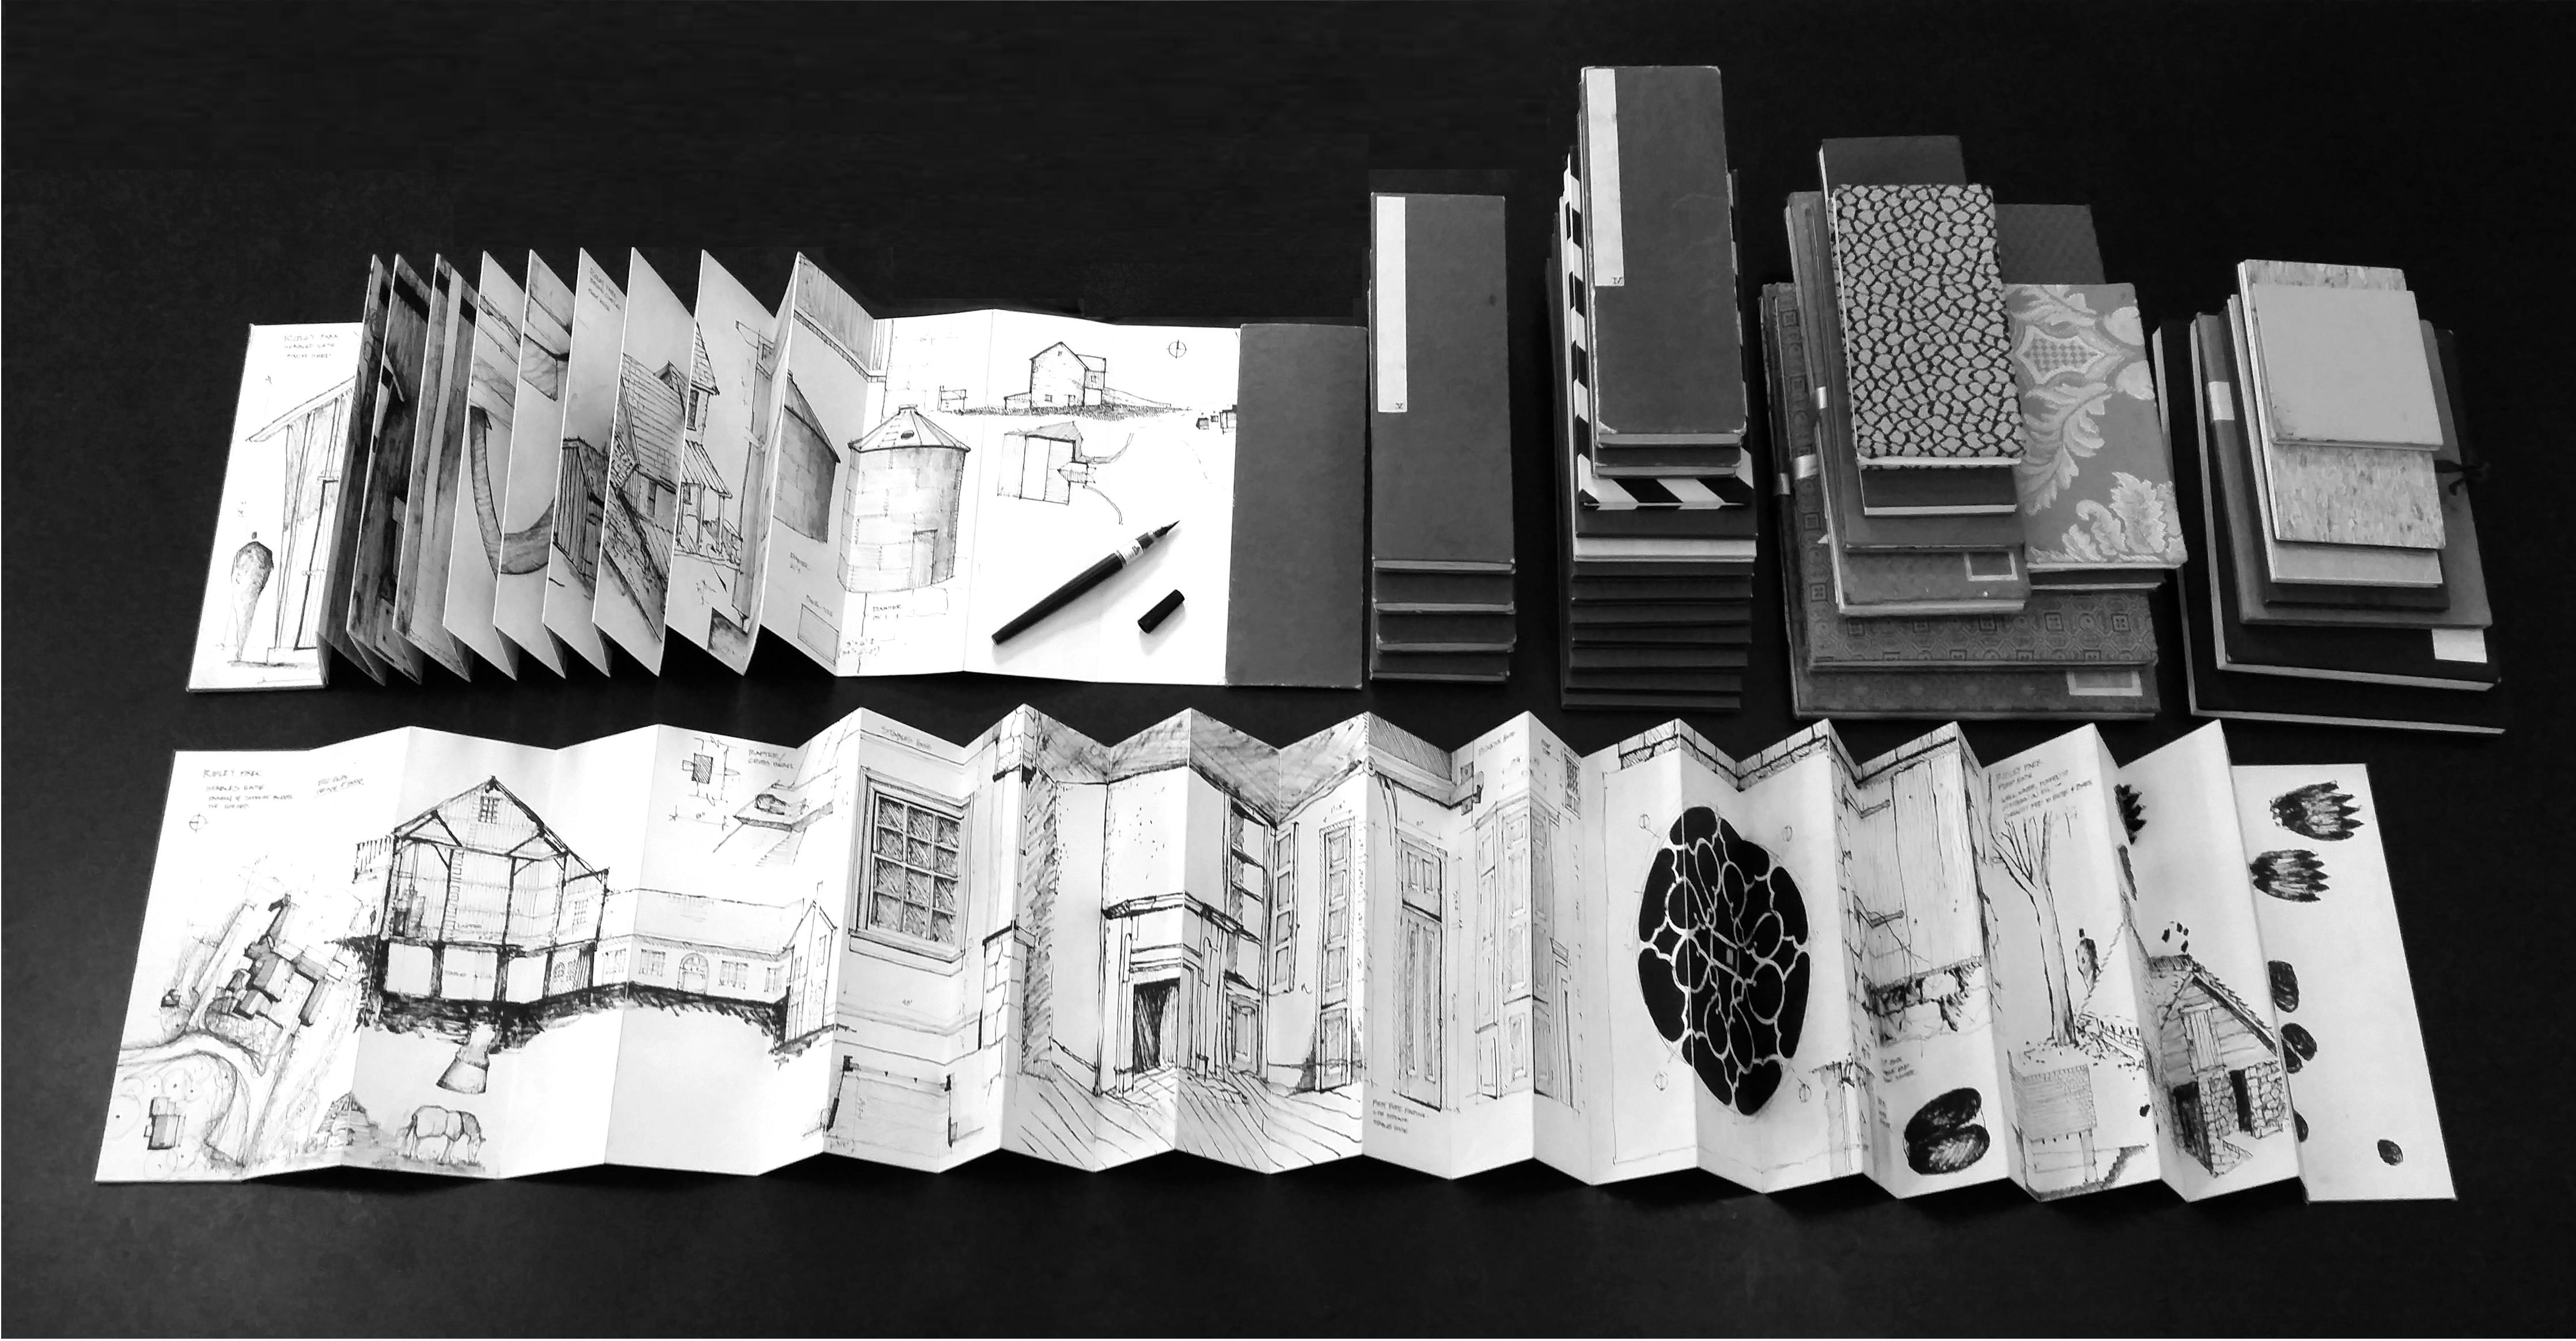 Sample sketchbooks unfolded with drawing brush pen